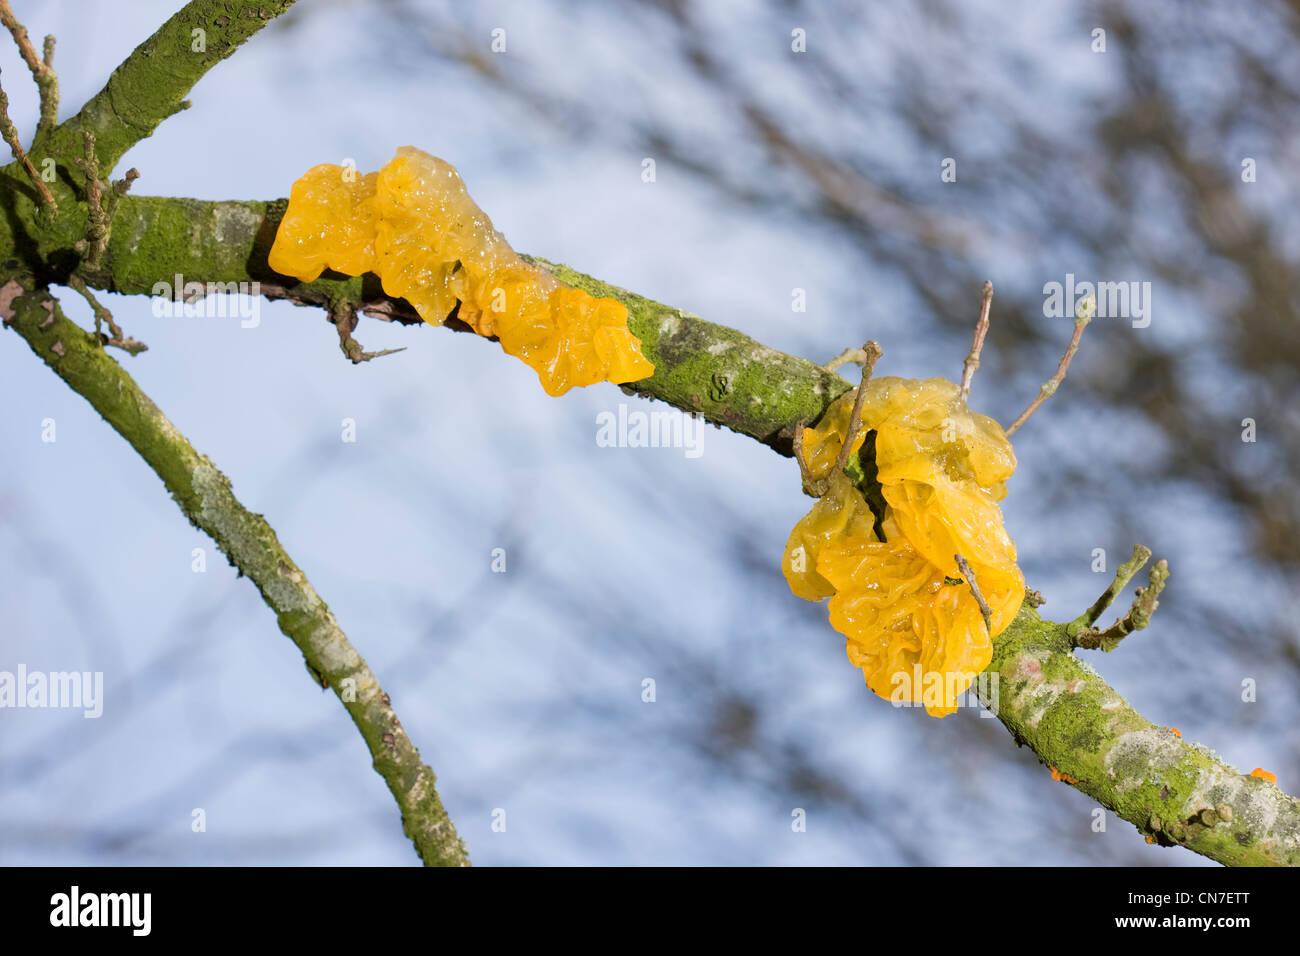 Yellow Brain Fungus or Golden Jelly Fungus (Tremella Mesenterica) on Oak. - Stock Image